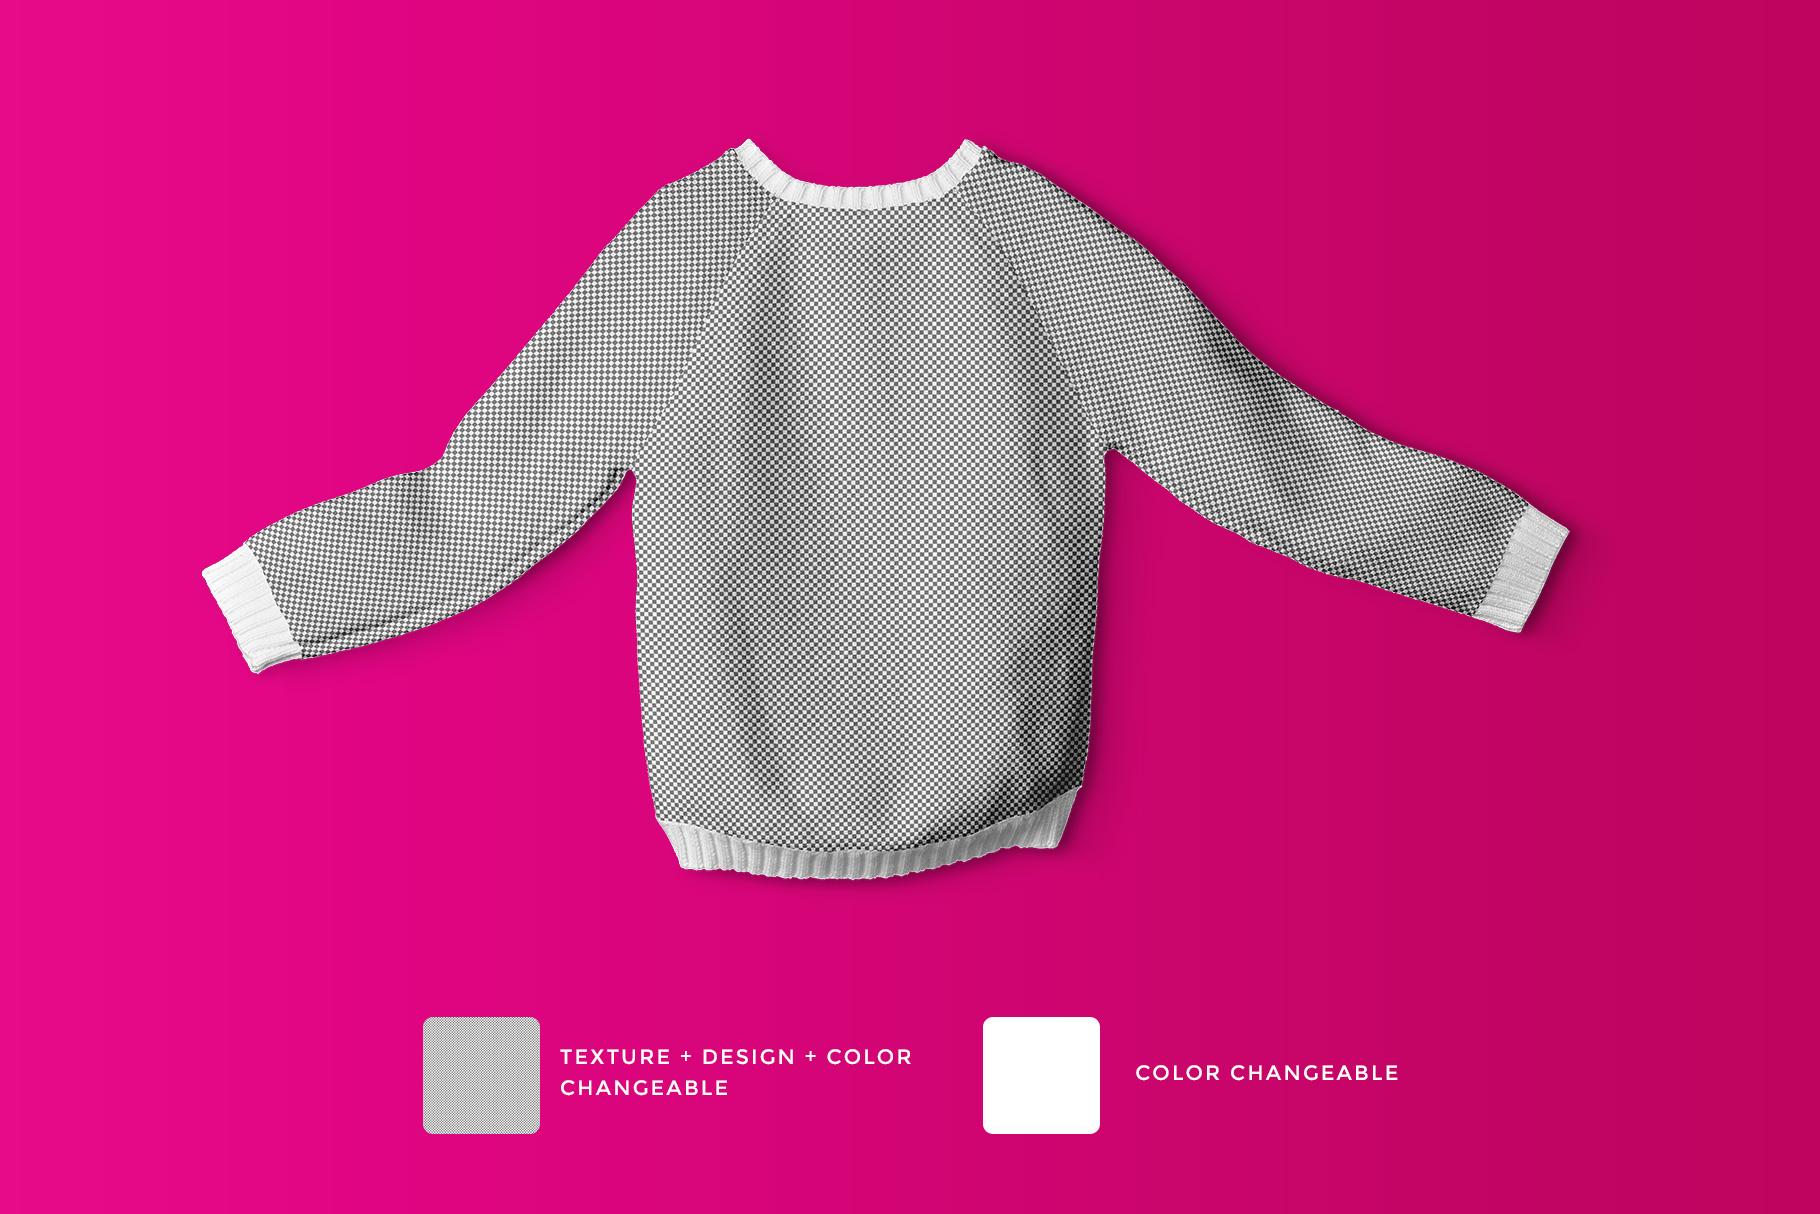 editability of the knitted kids jumper mockup